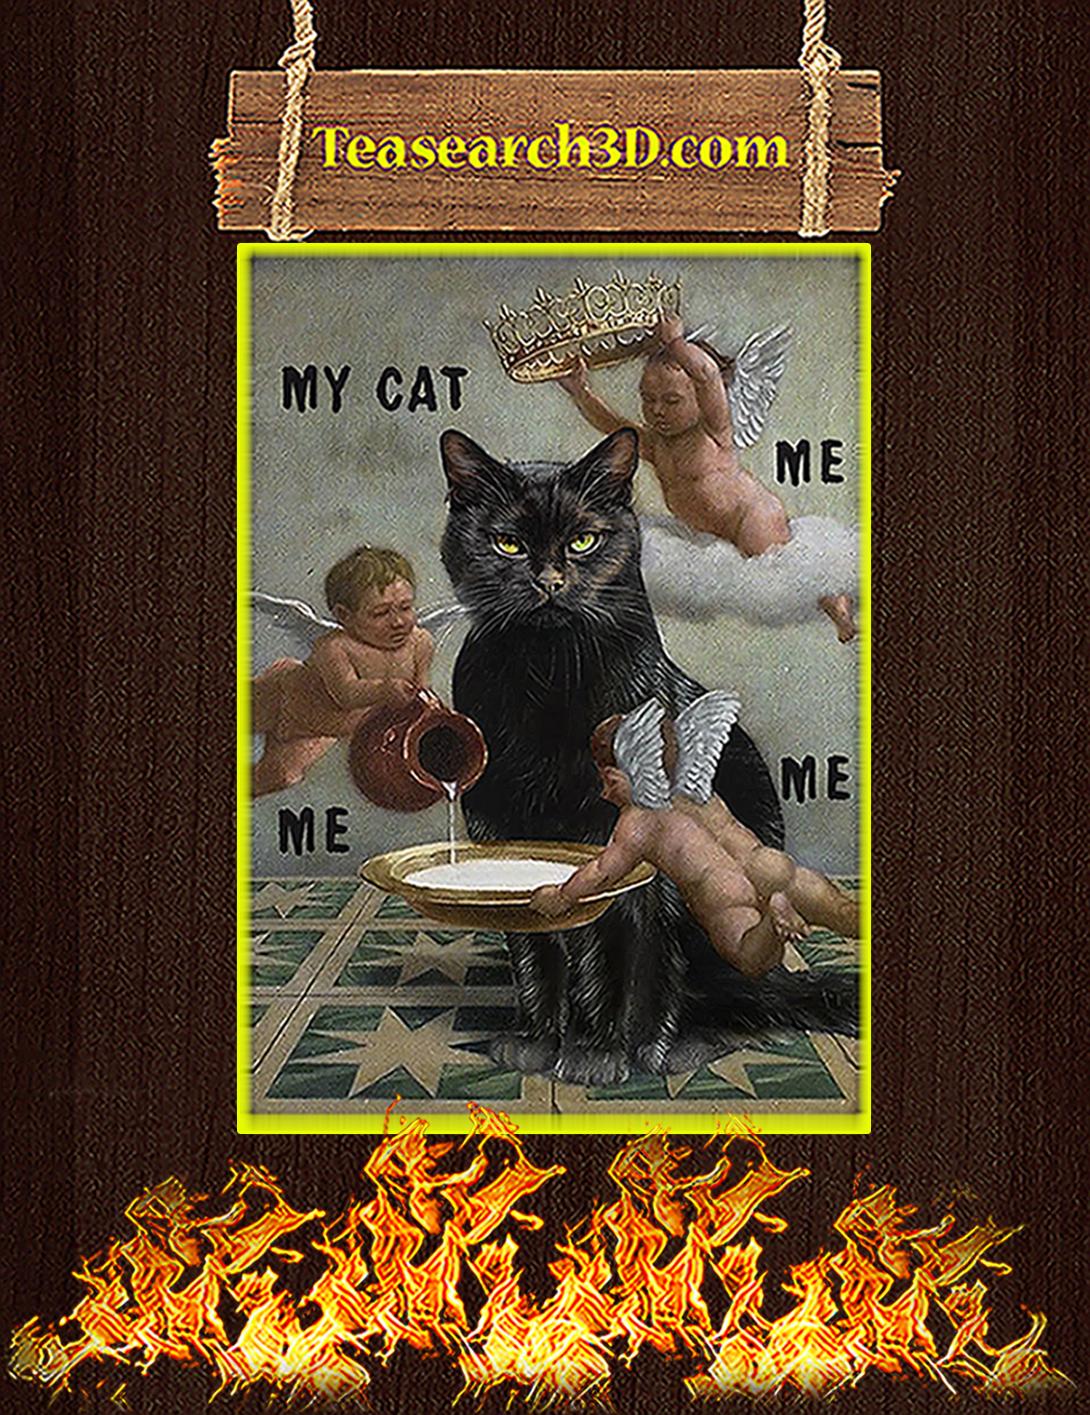 Black cat meme my cat me me me poster A2